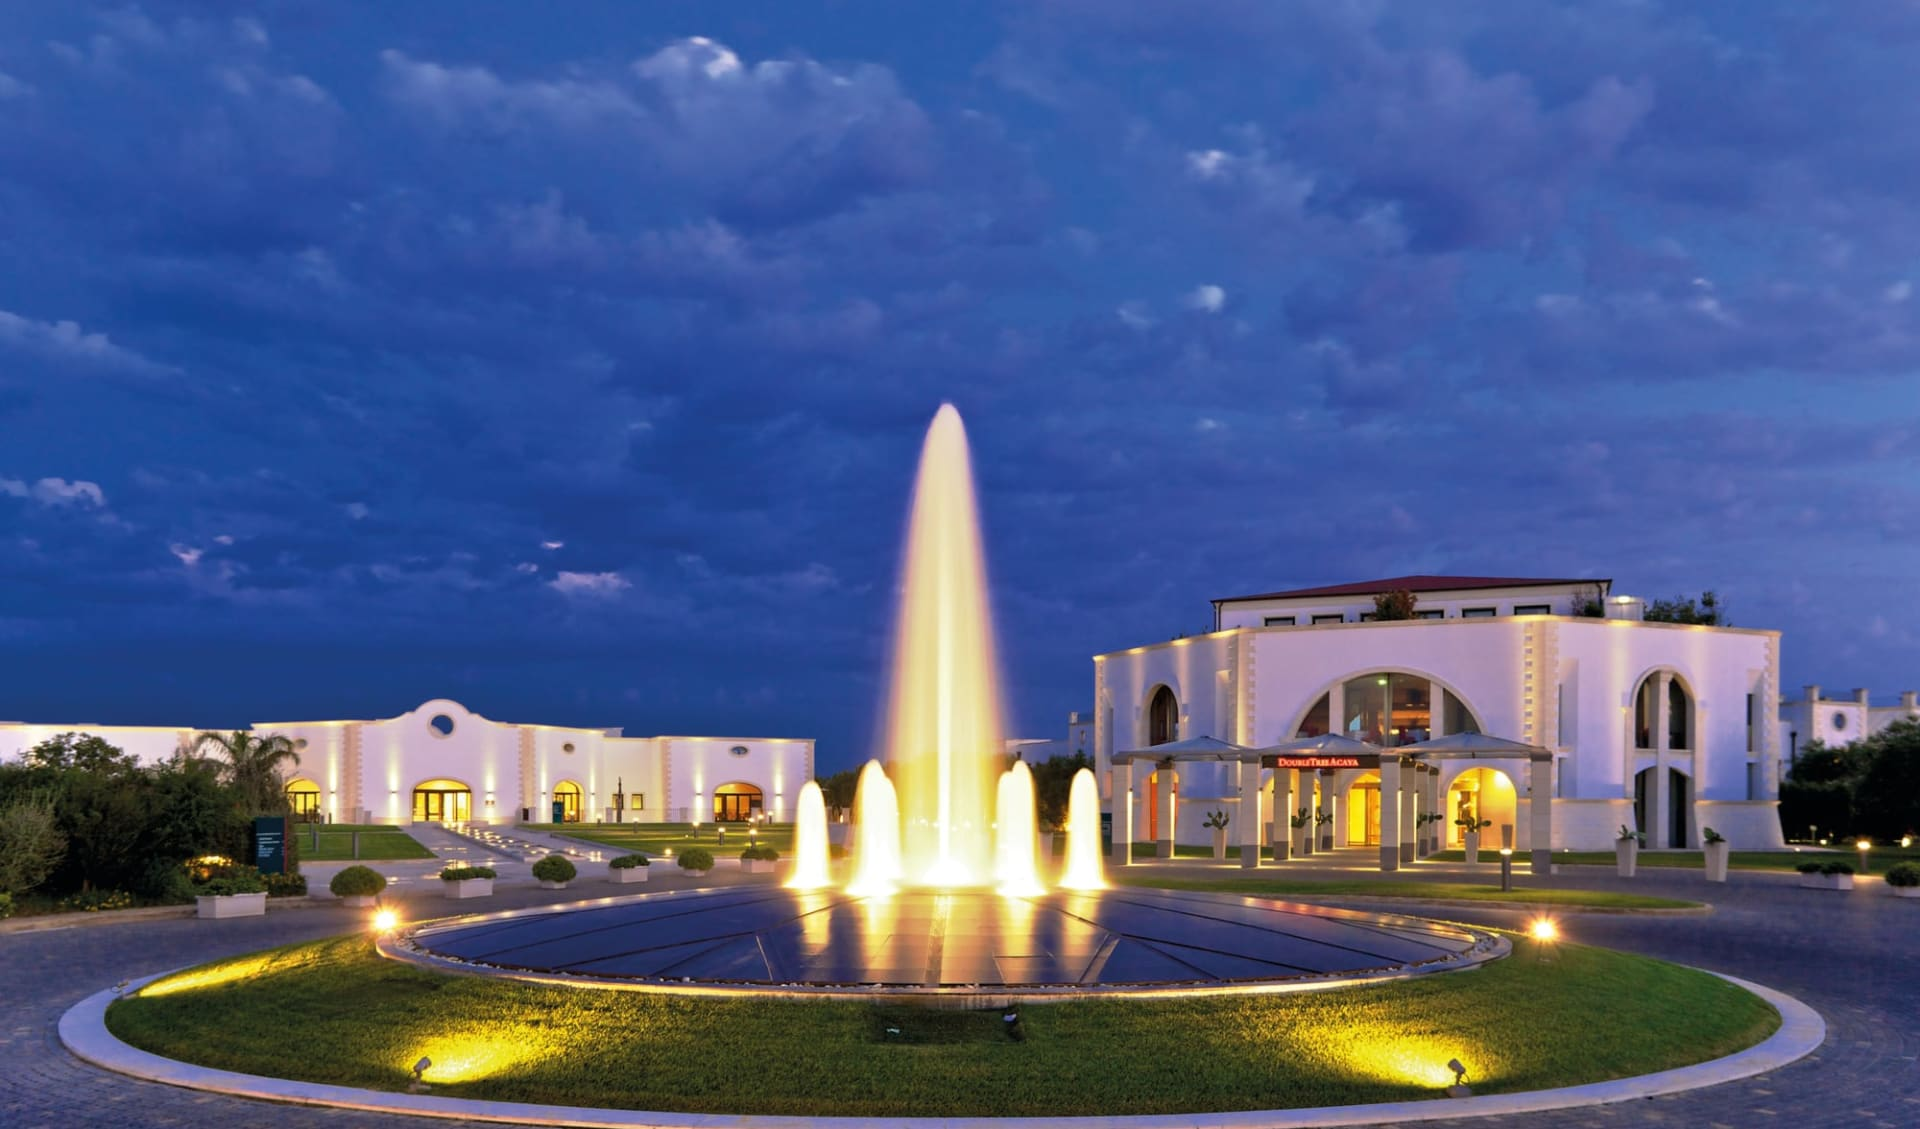 17.04. - 24.04.2022 Golf & Kultur in Apulien ab Brindisi: Acaya-Golf-Resort_Main-Entrance_IAGTO